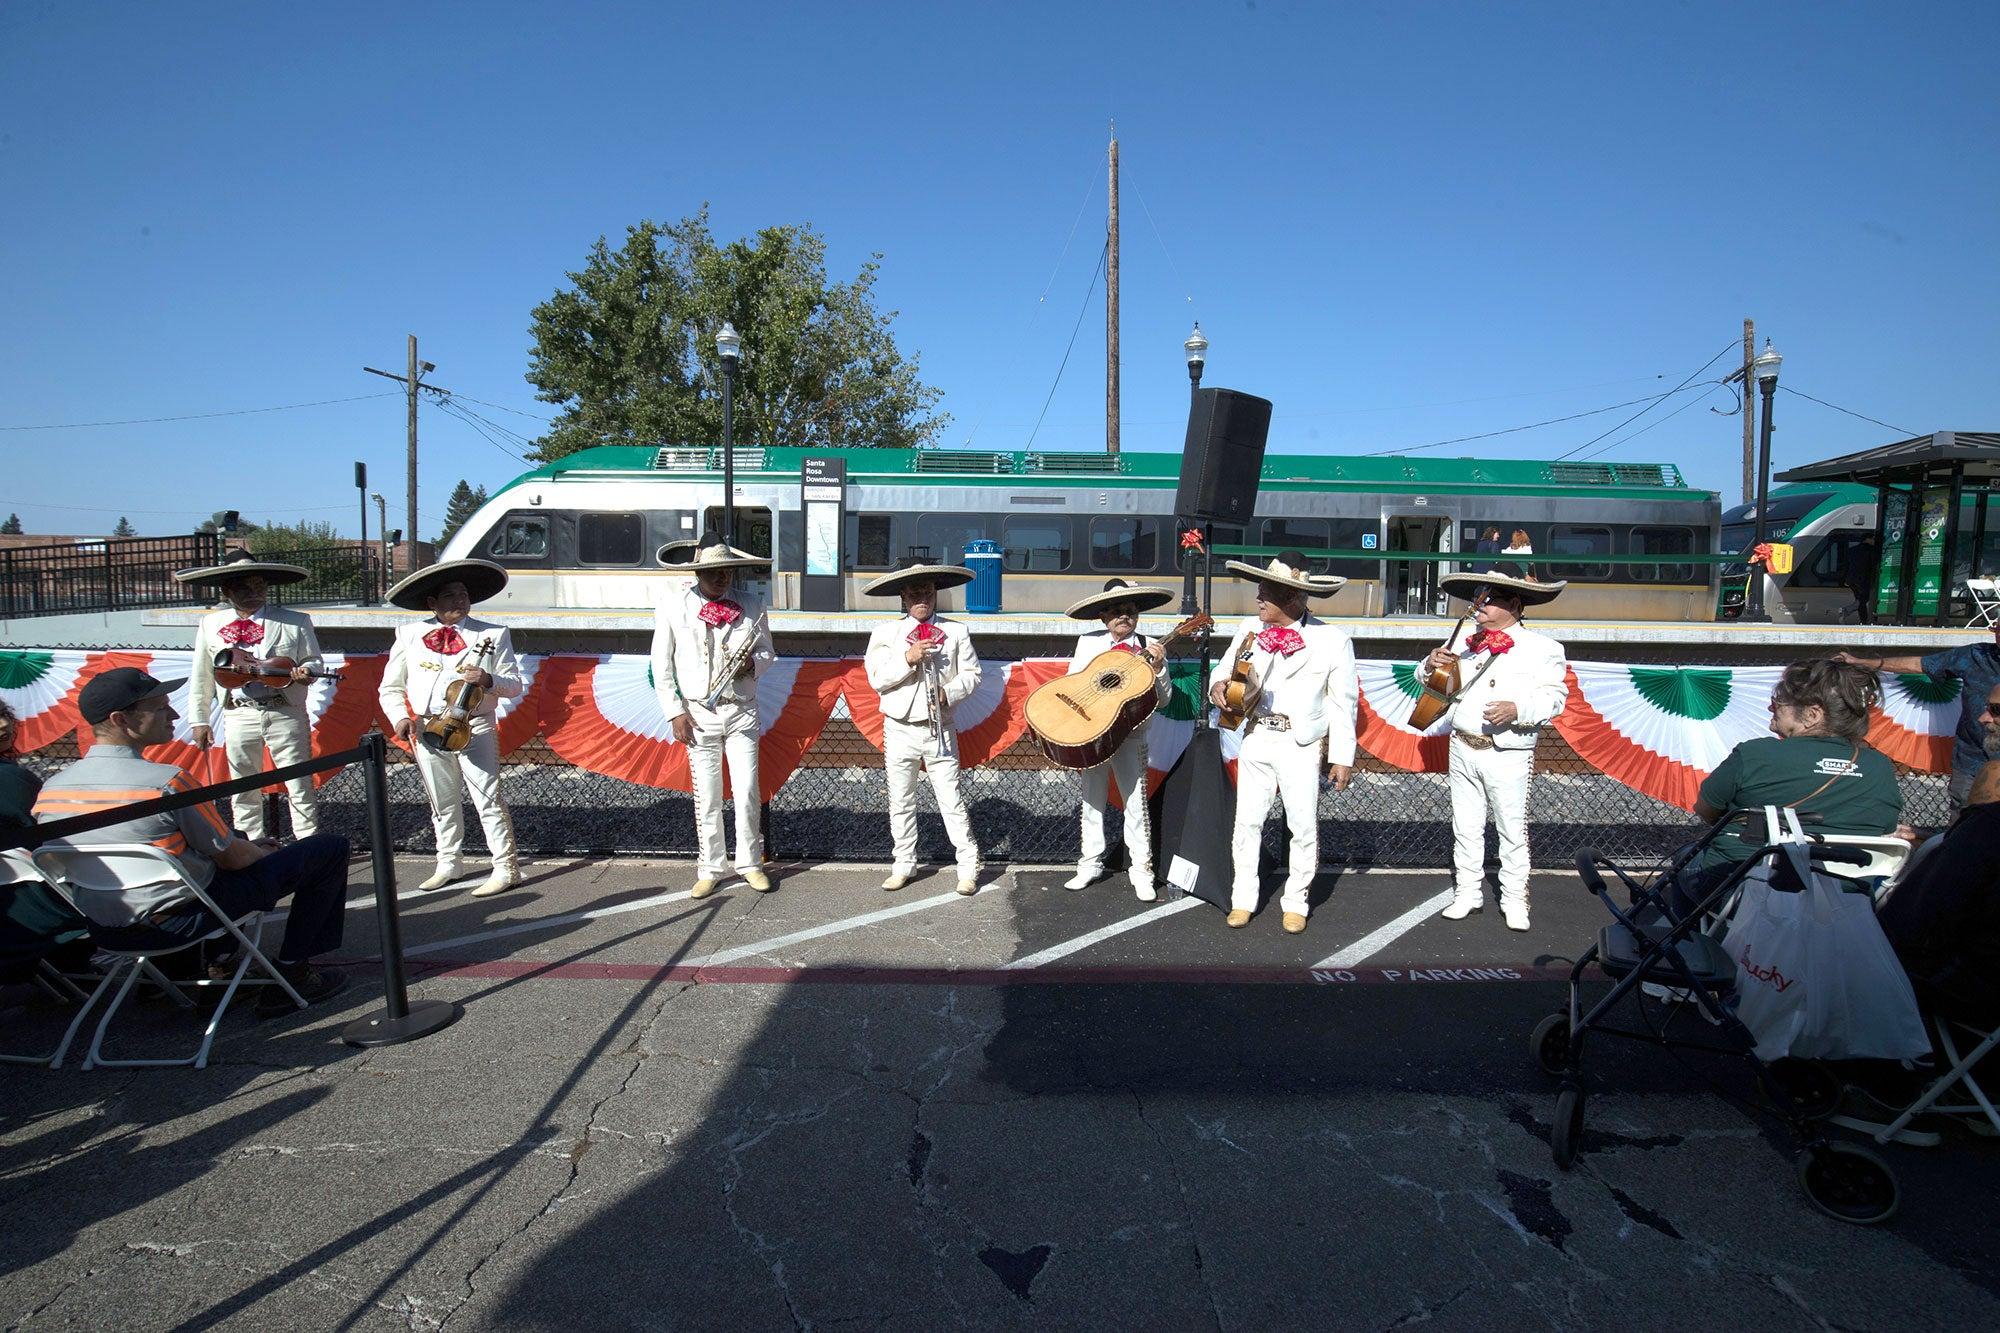 mariachi band plays